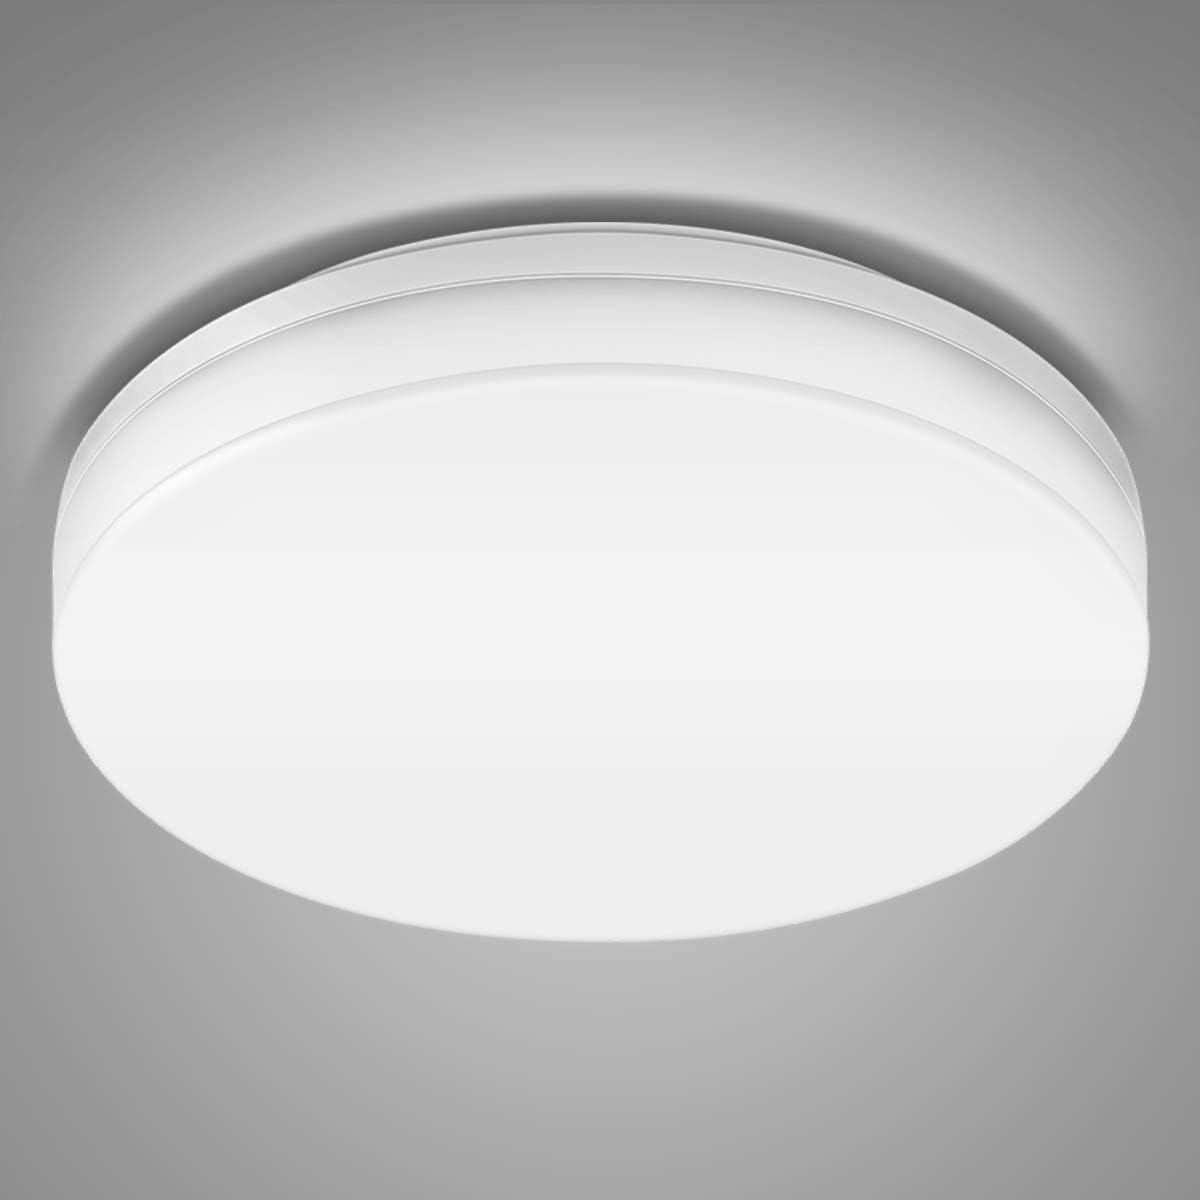 amazon co uk ceiling lighting rh amazon co uk Bathroom Ceiling Lighting Ideas Bathroom Ceiling Lighting Ideas